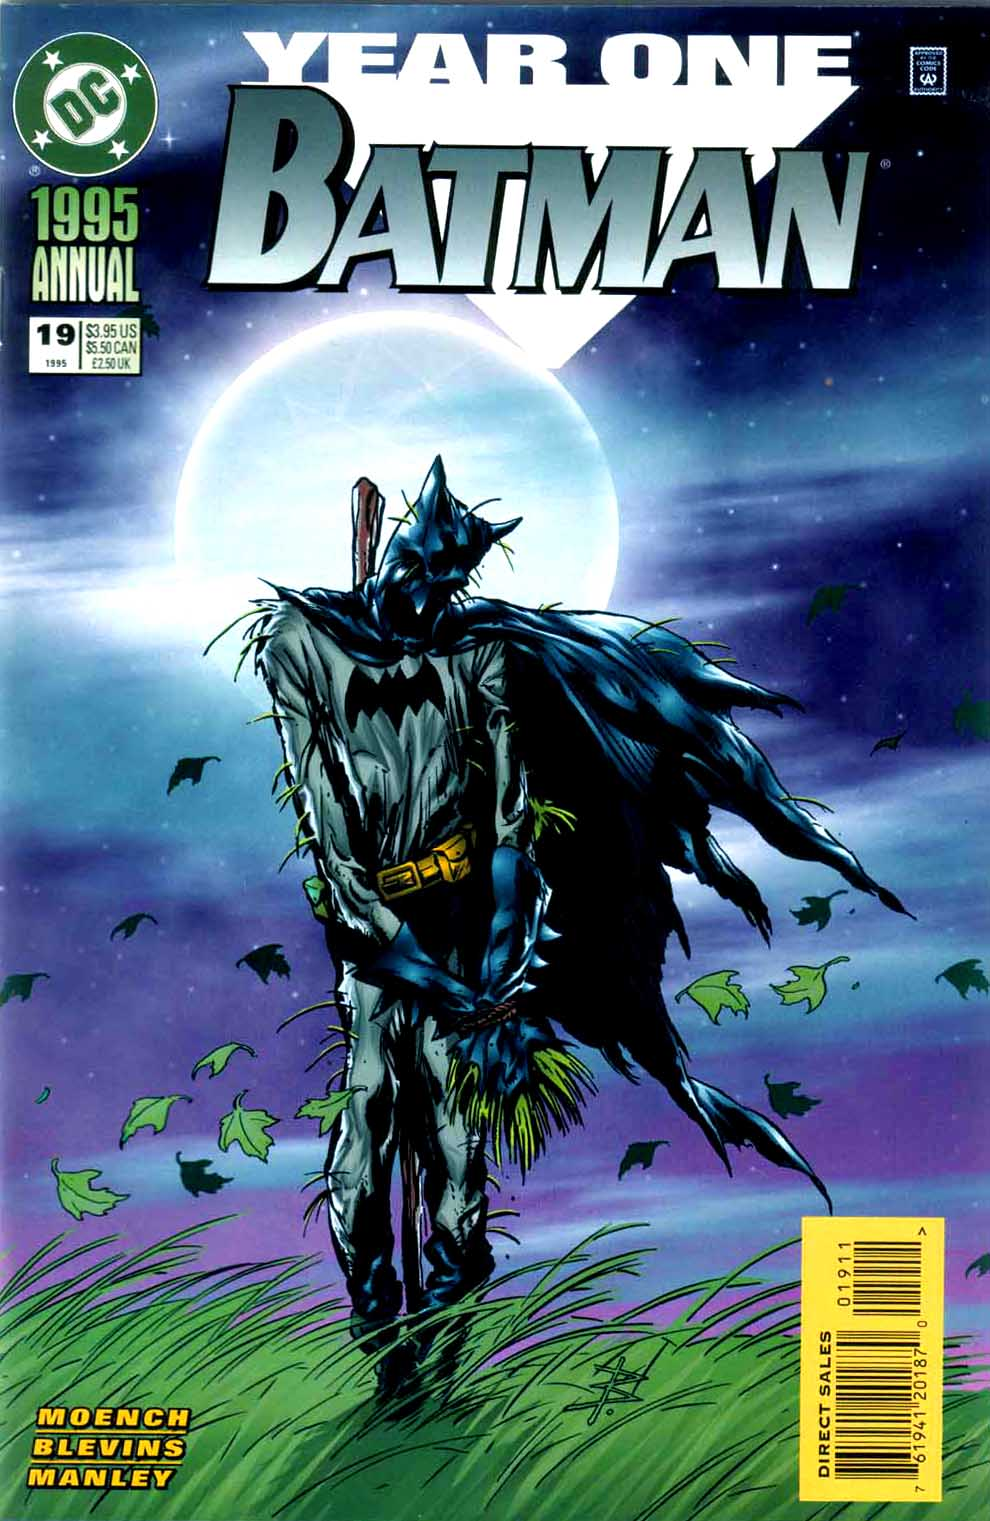 Batman: Four of a Kind 3_Batman_Annual Page 1